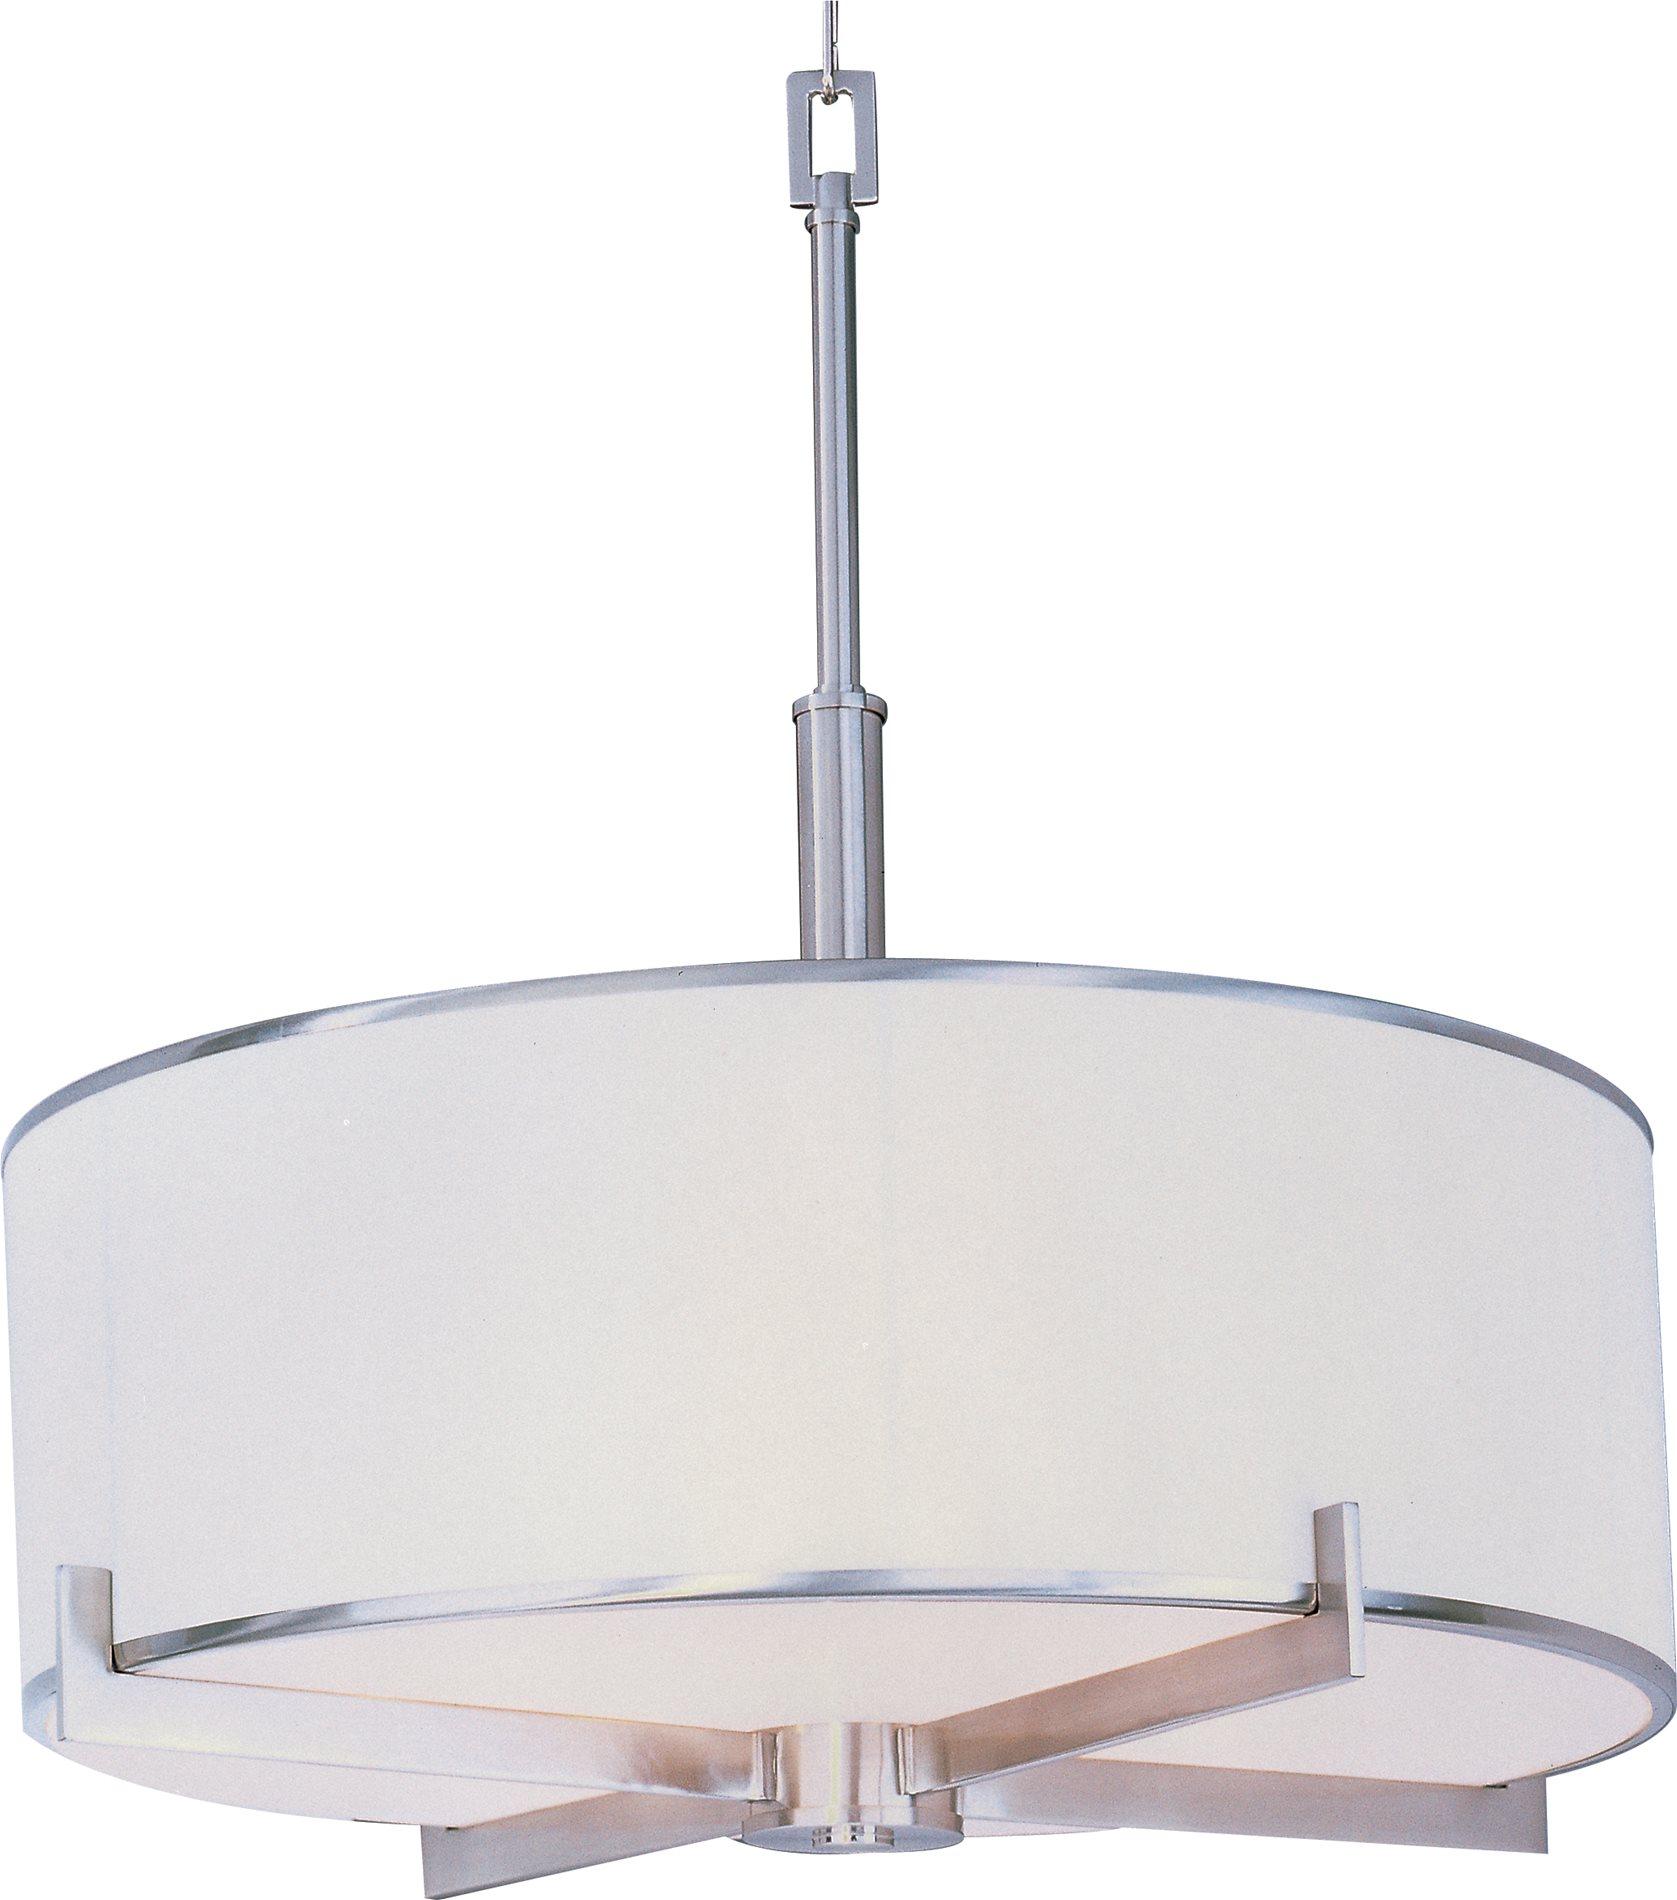 zoom. maxim lighting wtsn nexus modern  contemporary drum pendant